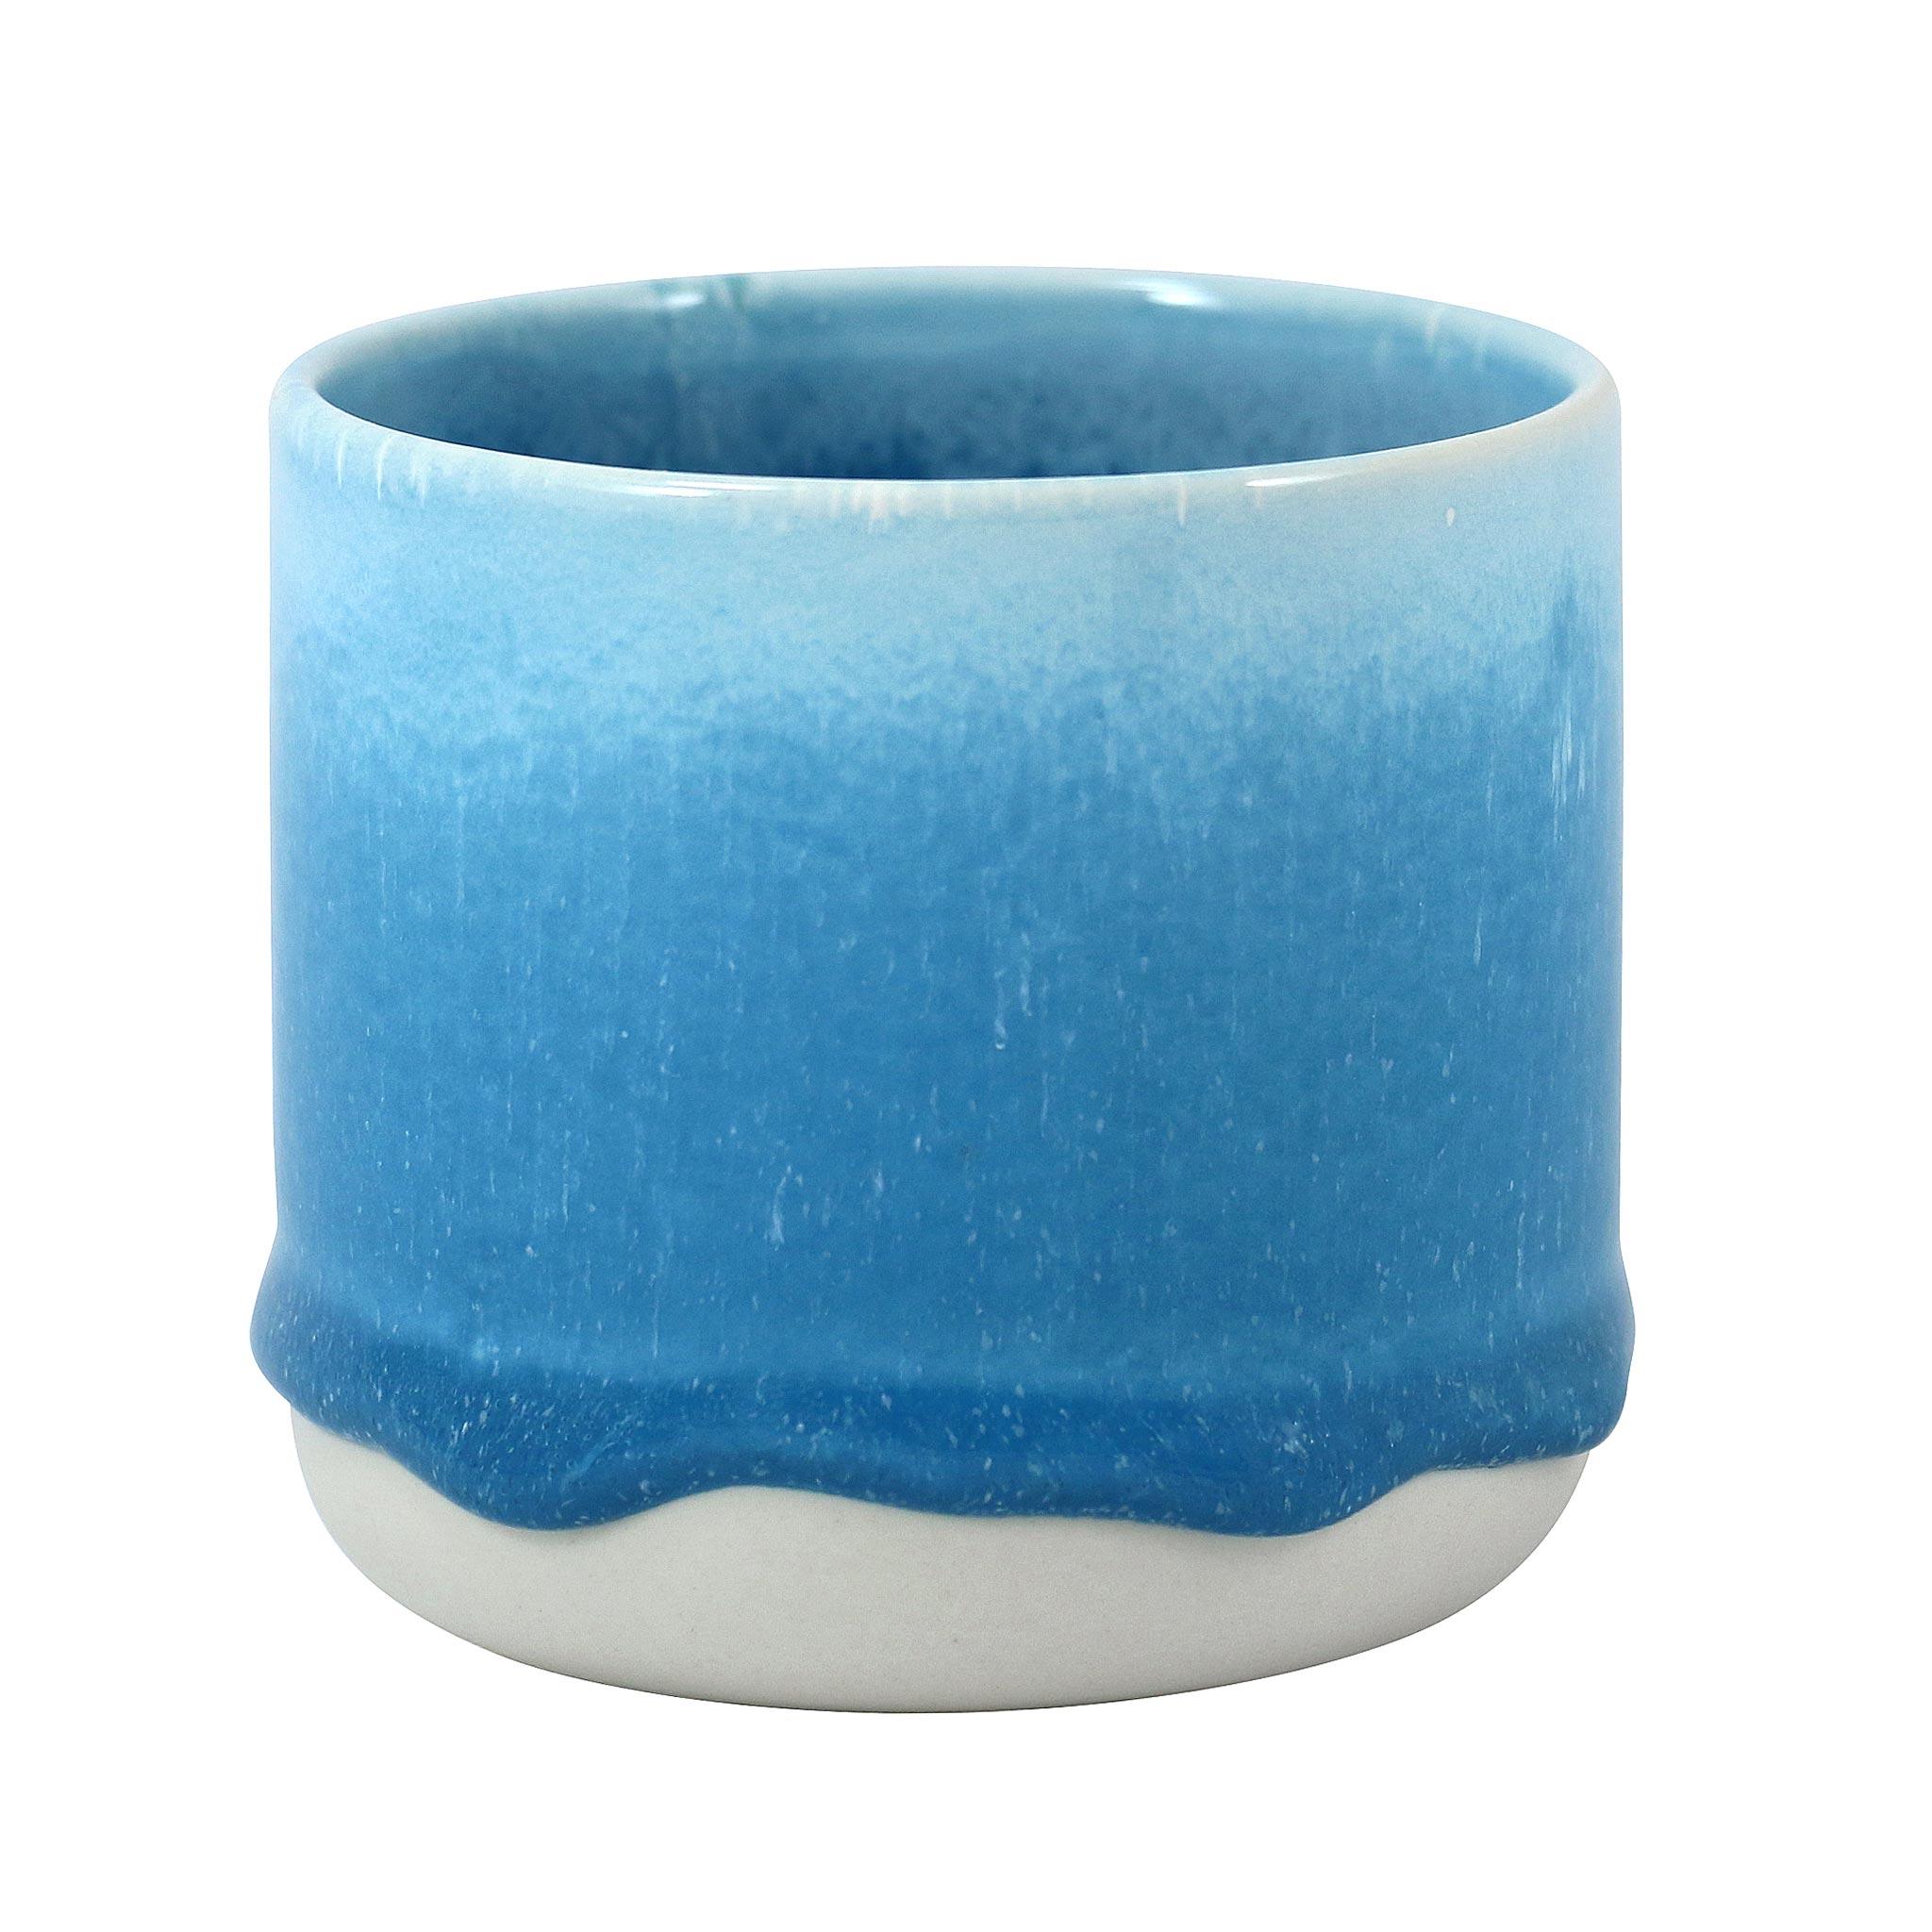 STUDIO ARHØJ - Quench mug, Blue Sea